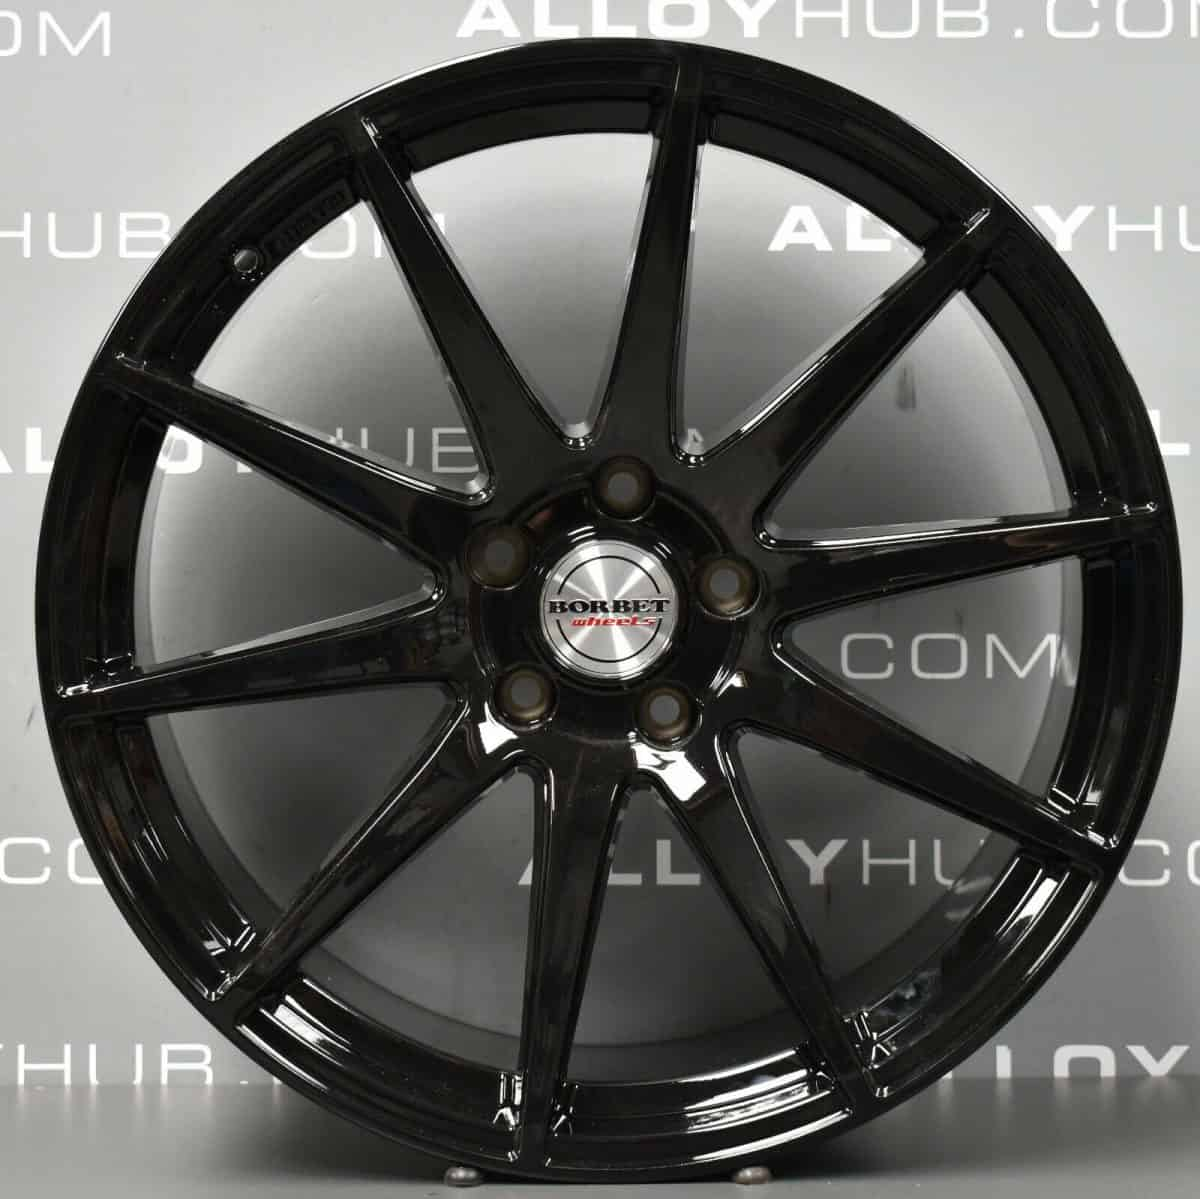 "Genuine VEA Borbet Volkswagen Amarok 10 Spoke 20"" Inch Alloy Wheels with Gloss Black Finish"